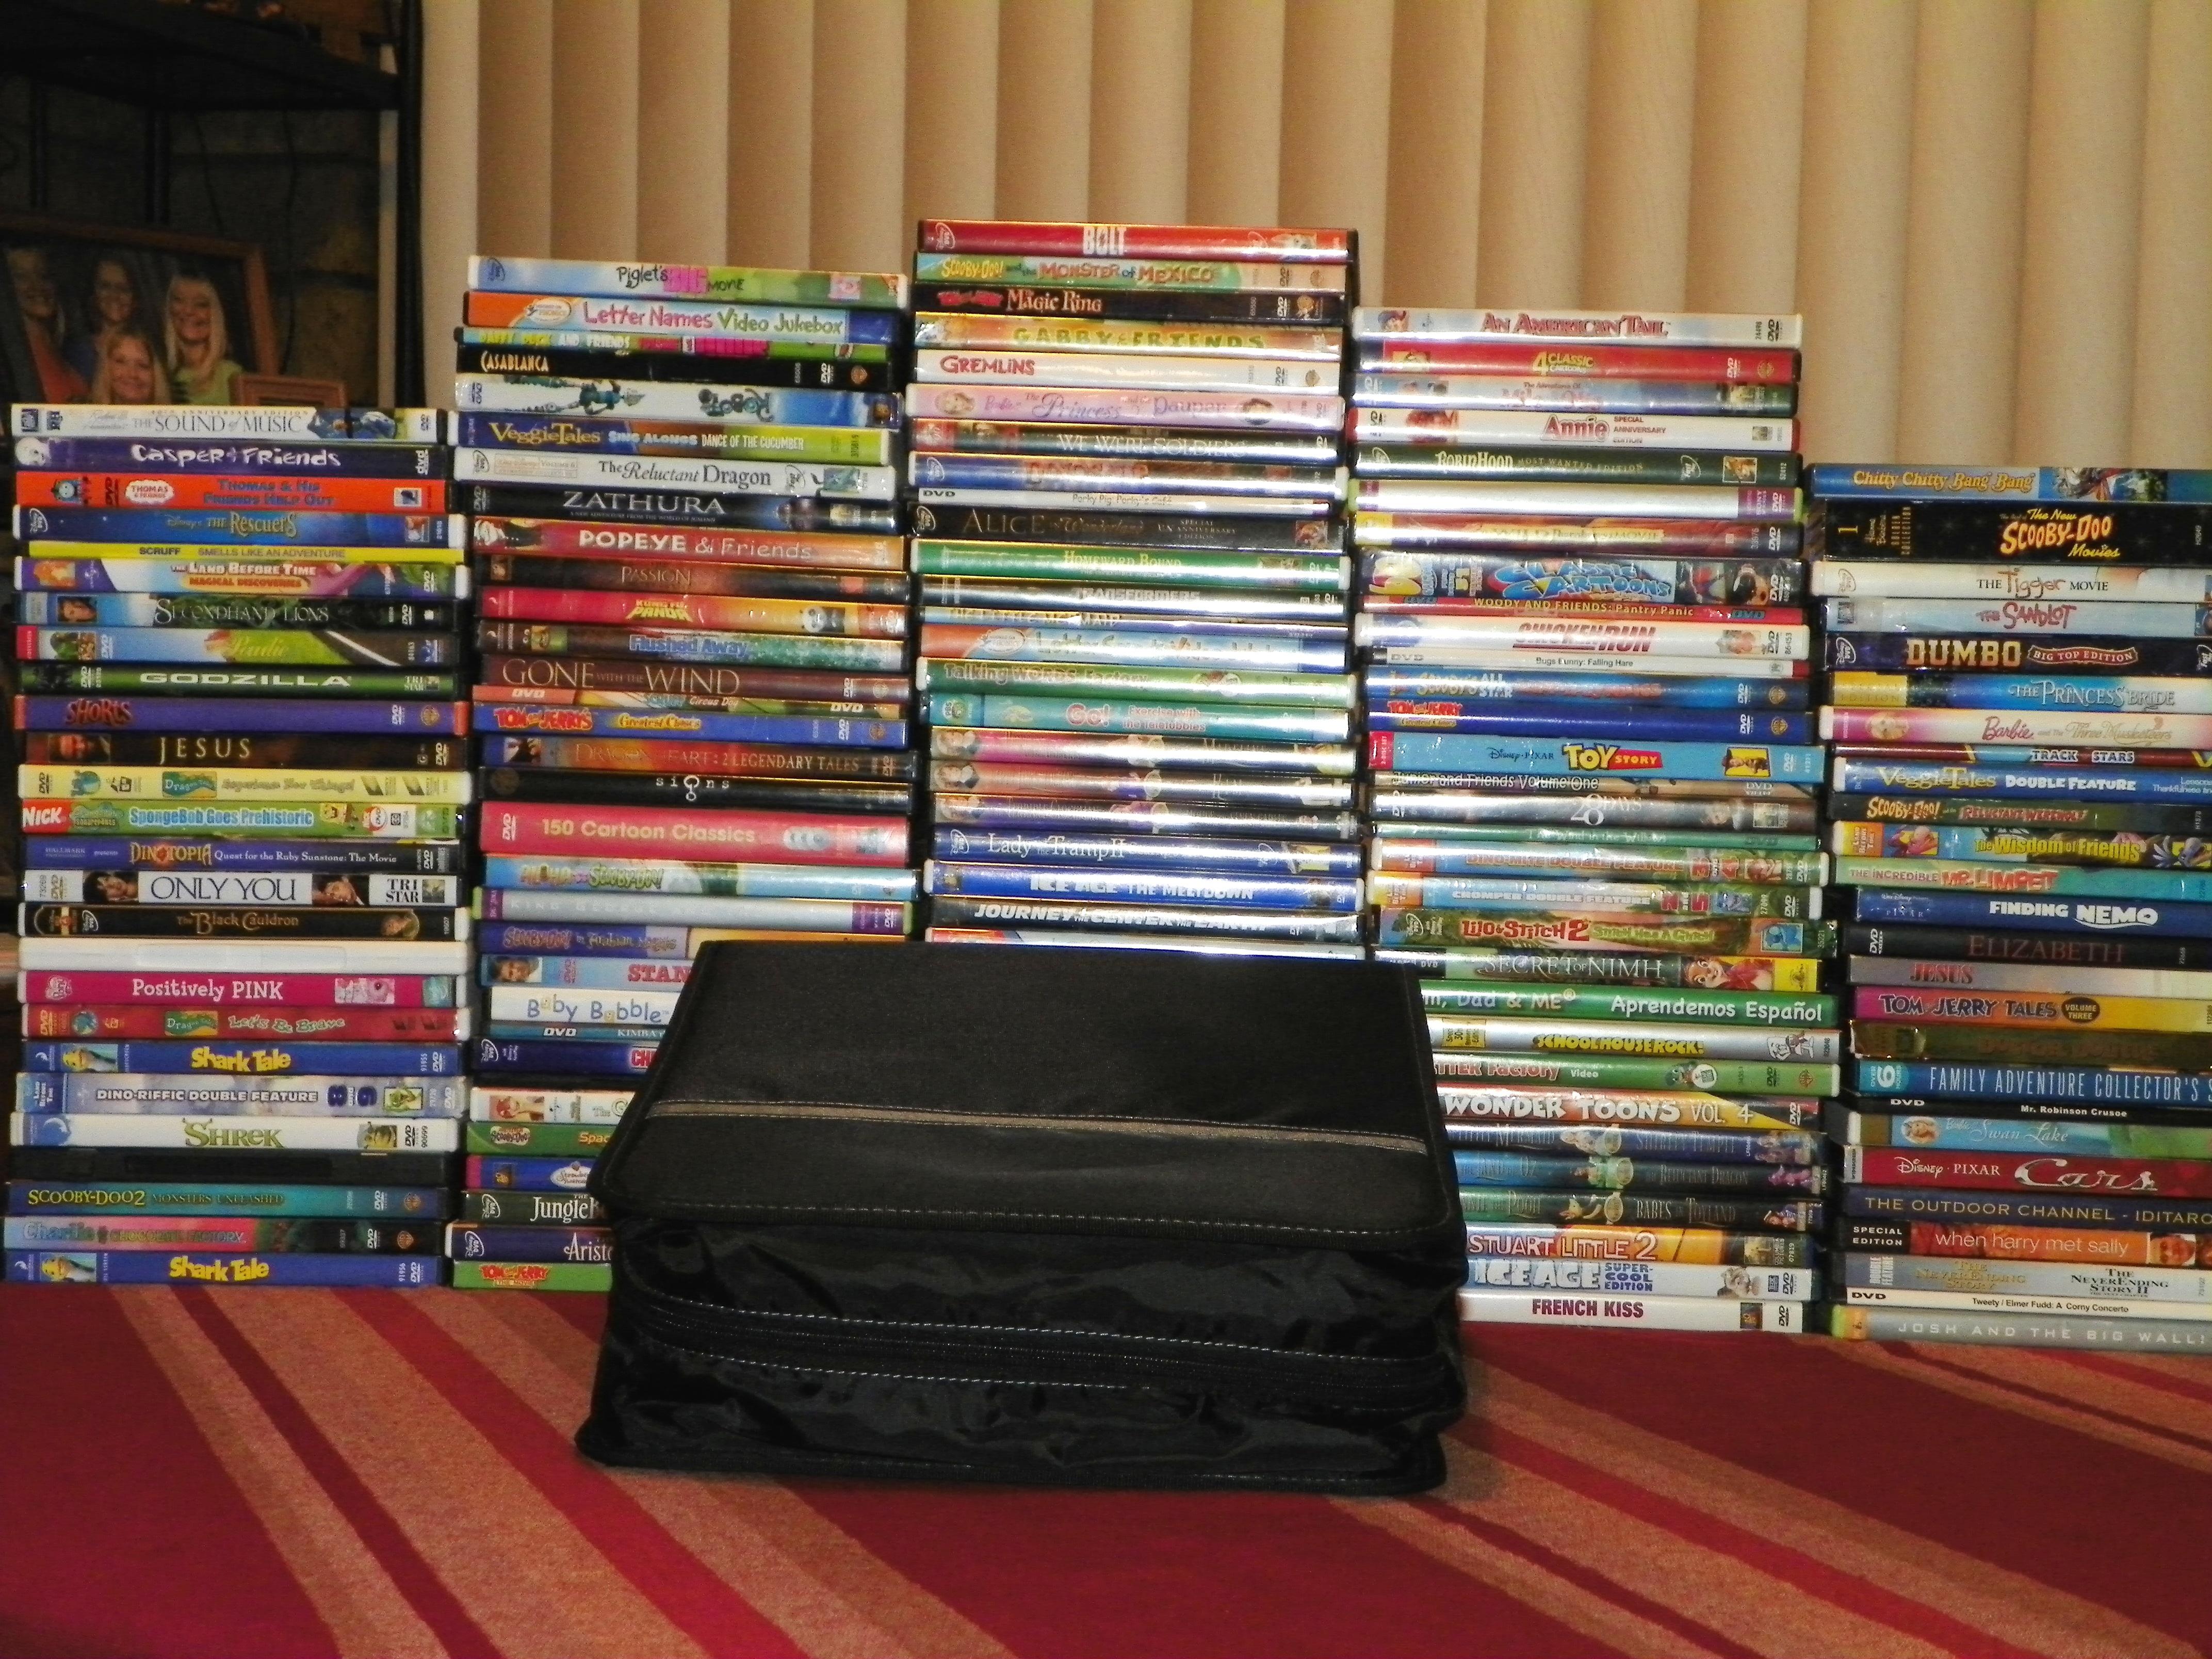 dvd space saver